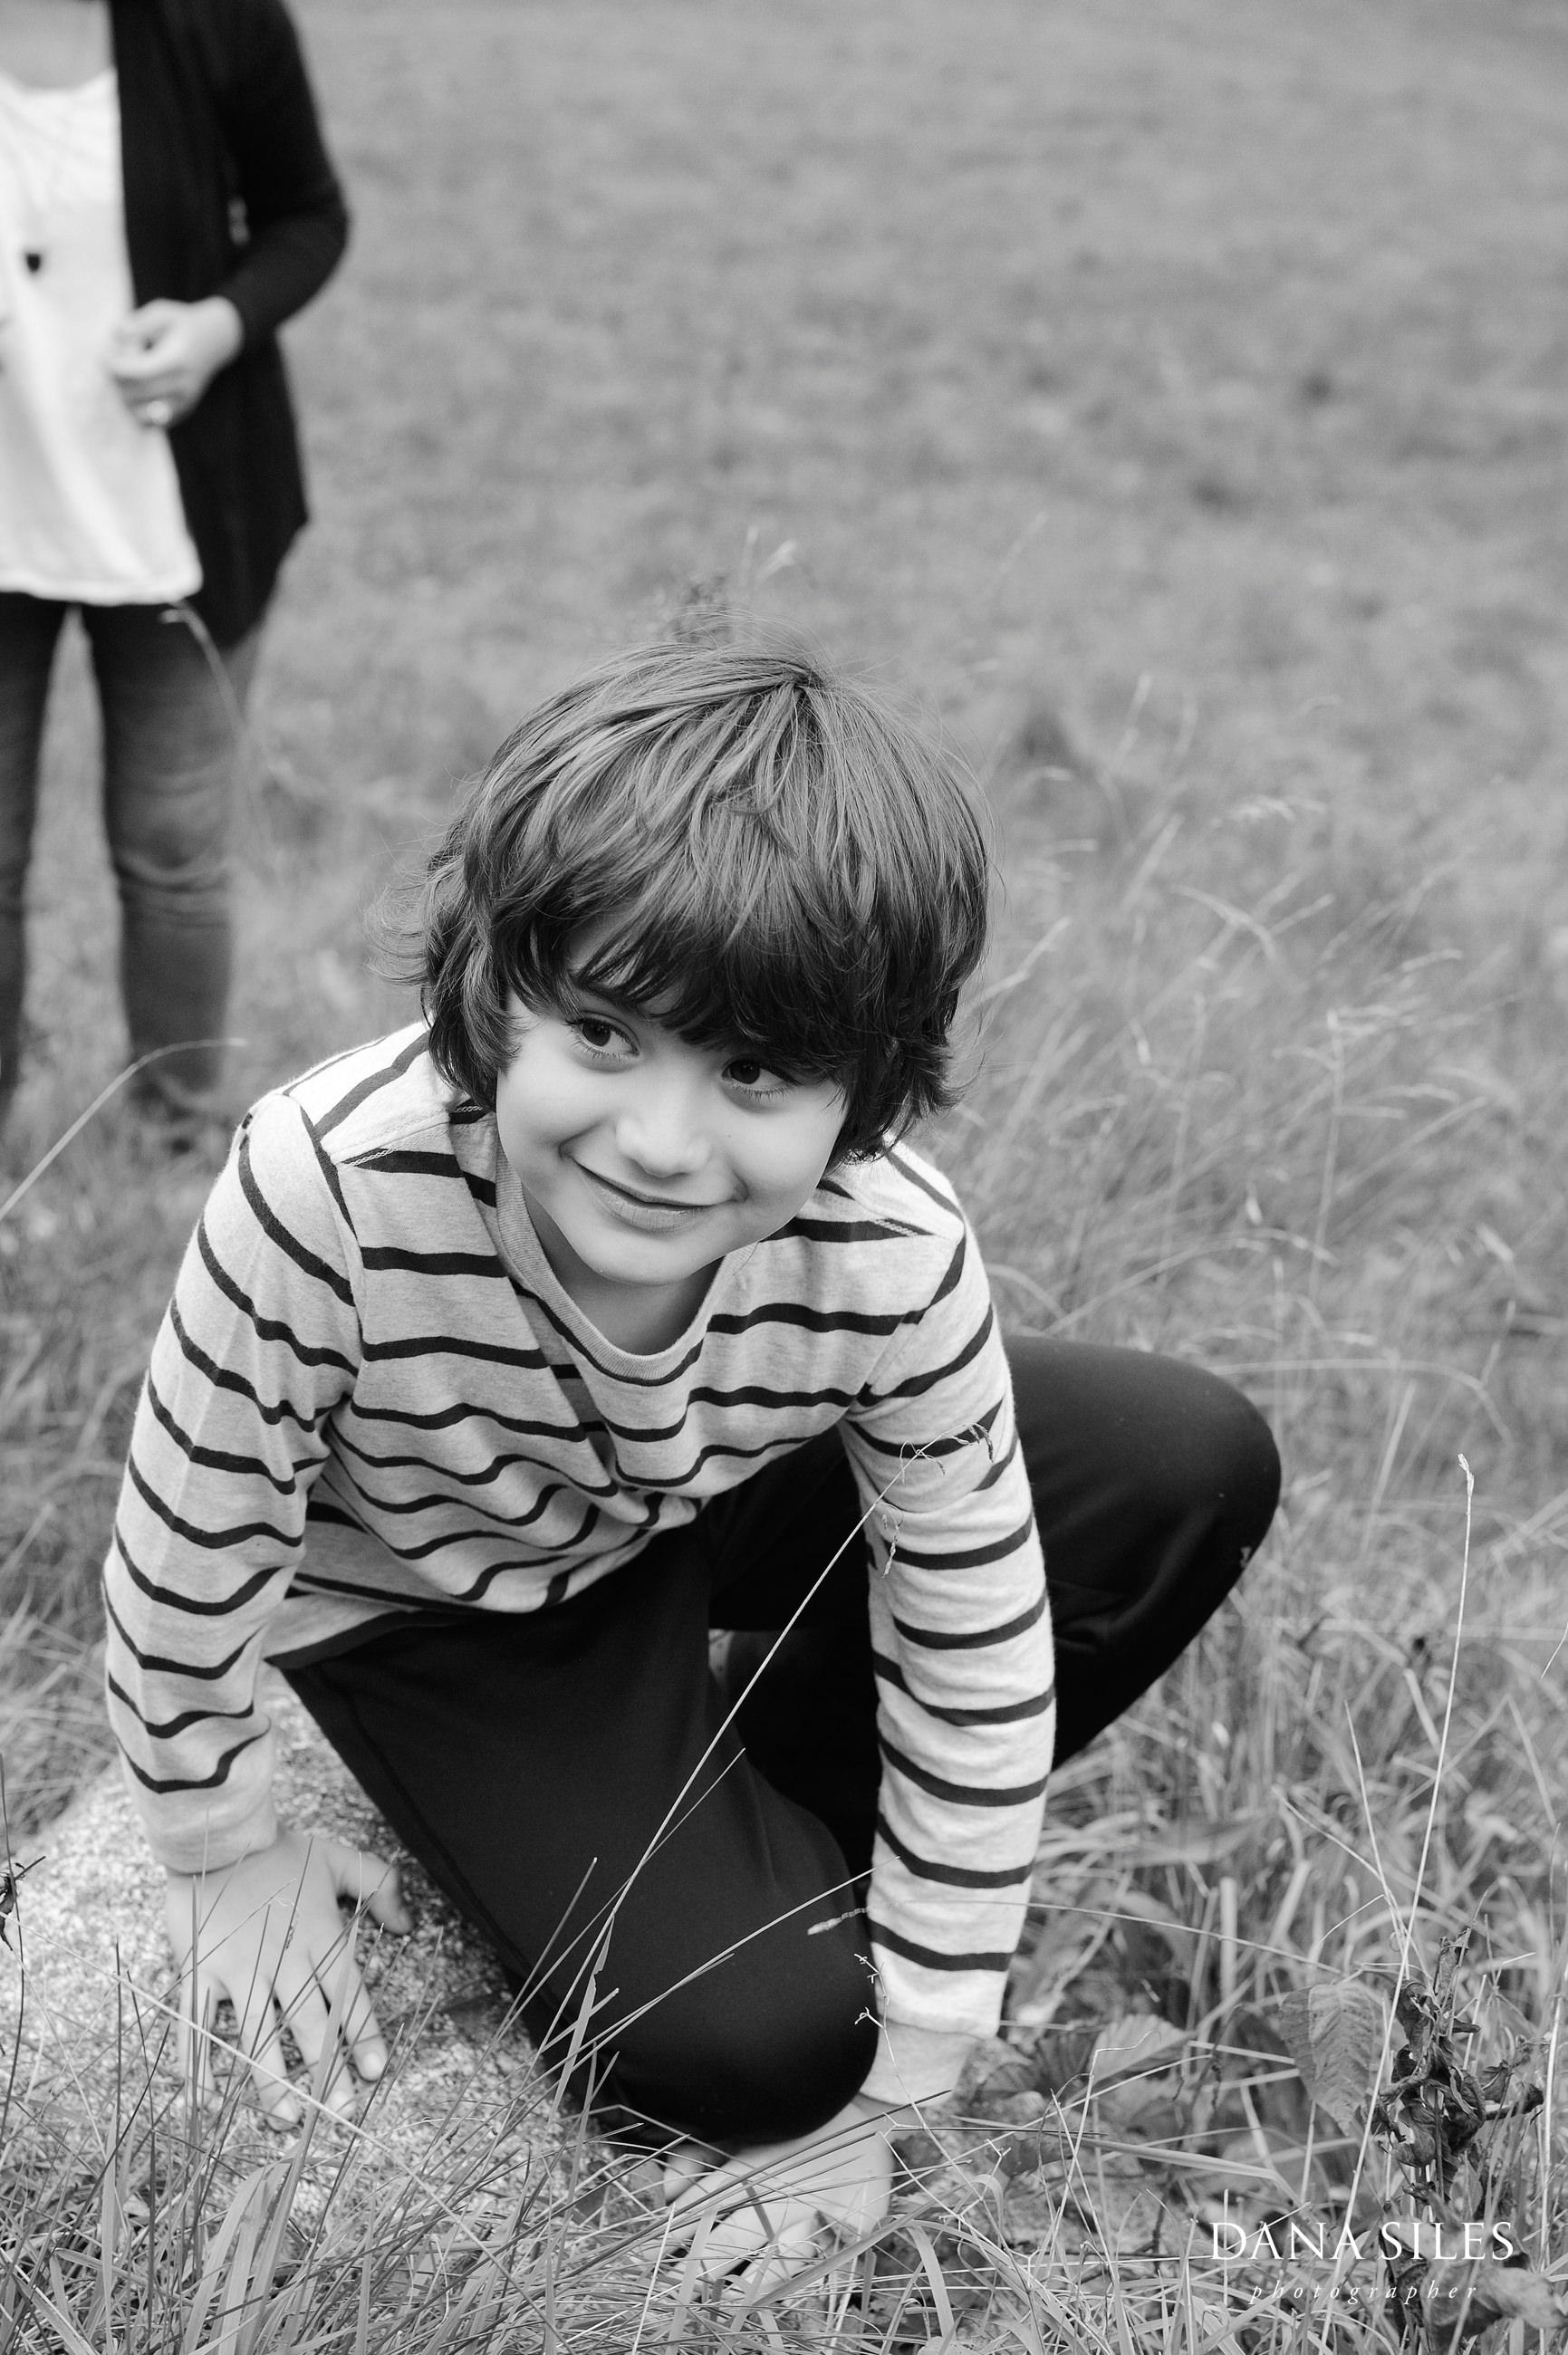 Phillips-Fall-Family-Portrait-Waltham-MA-Dana-Siles-Photographer-03